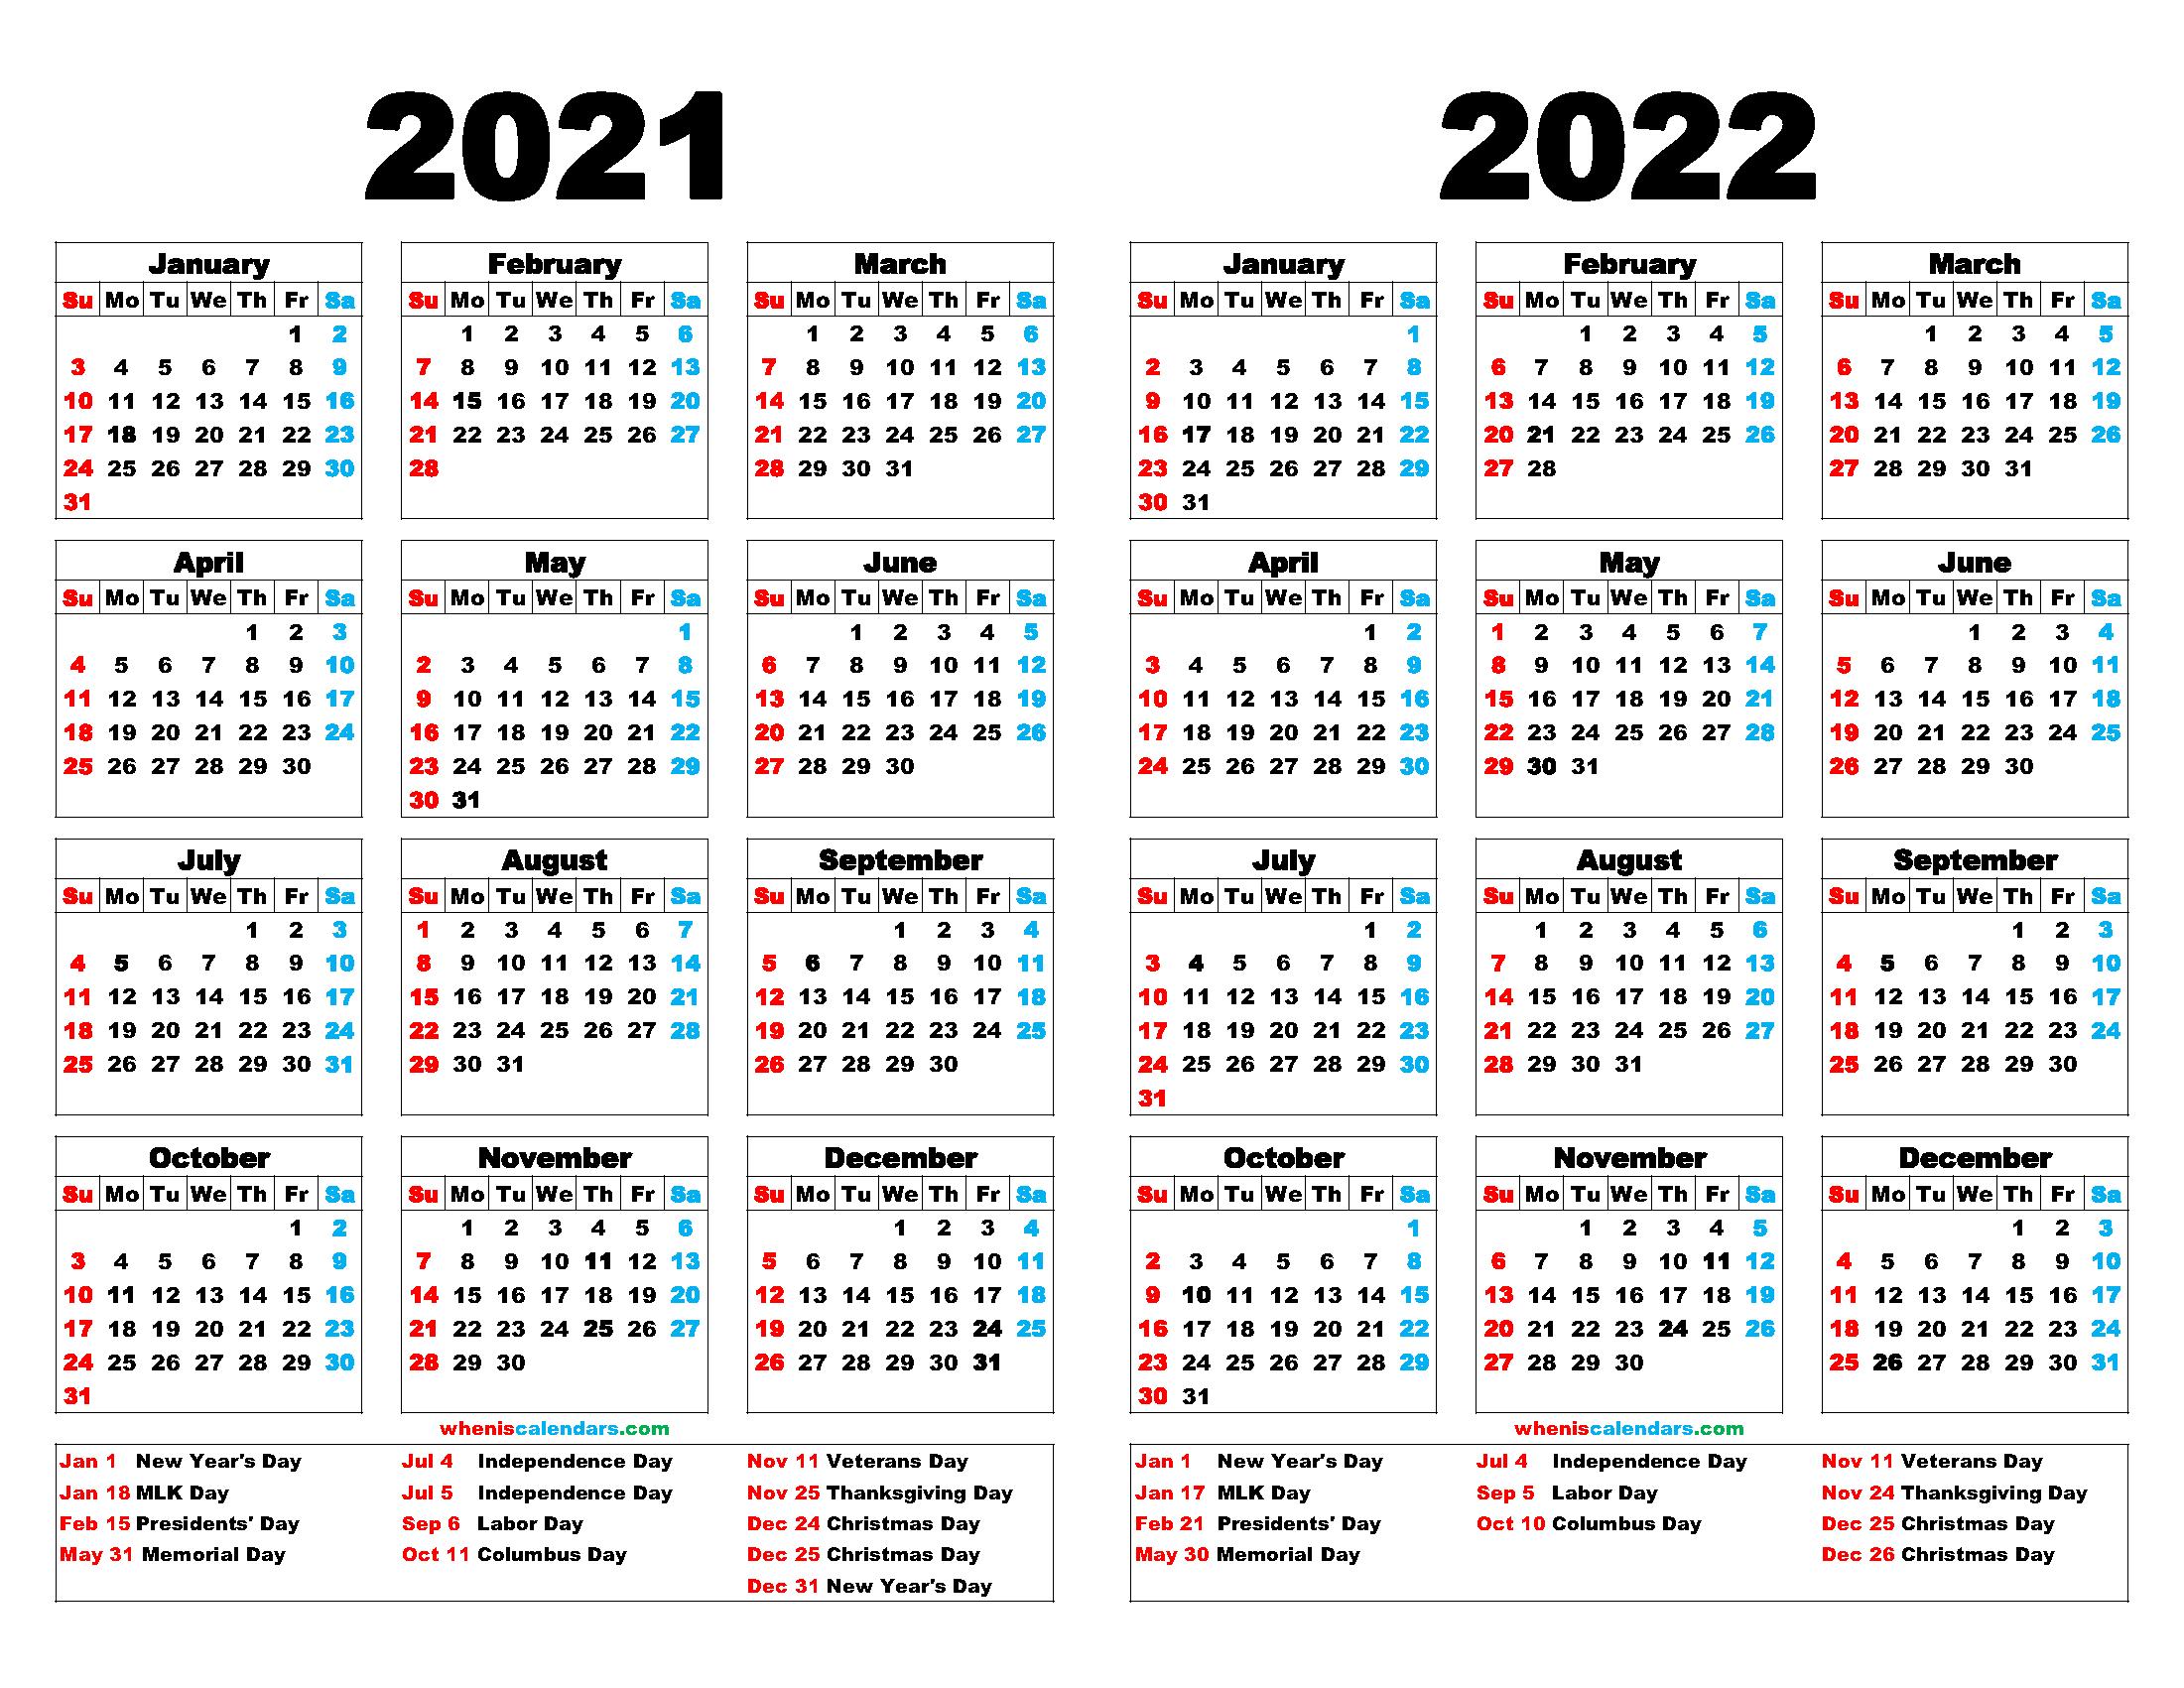 2021 And 2022 Calendar Printable 12 Templates Calendar Printables Calendar Calender Template